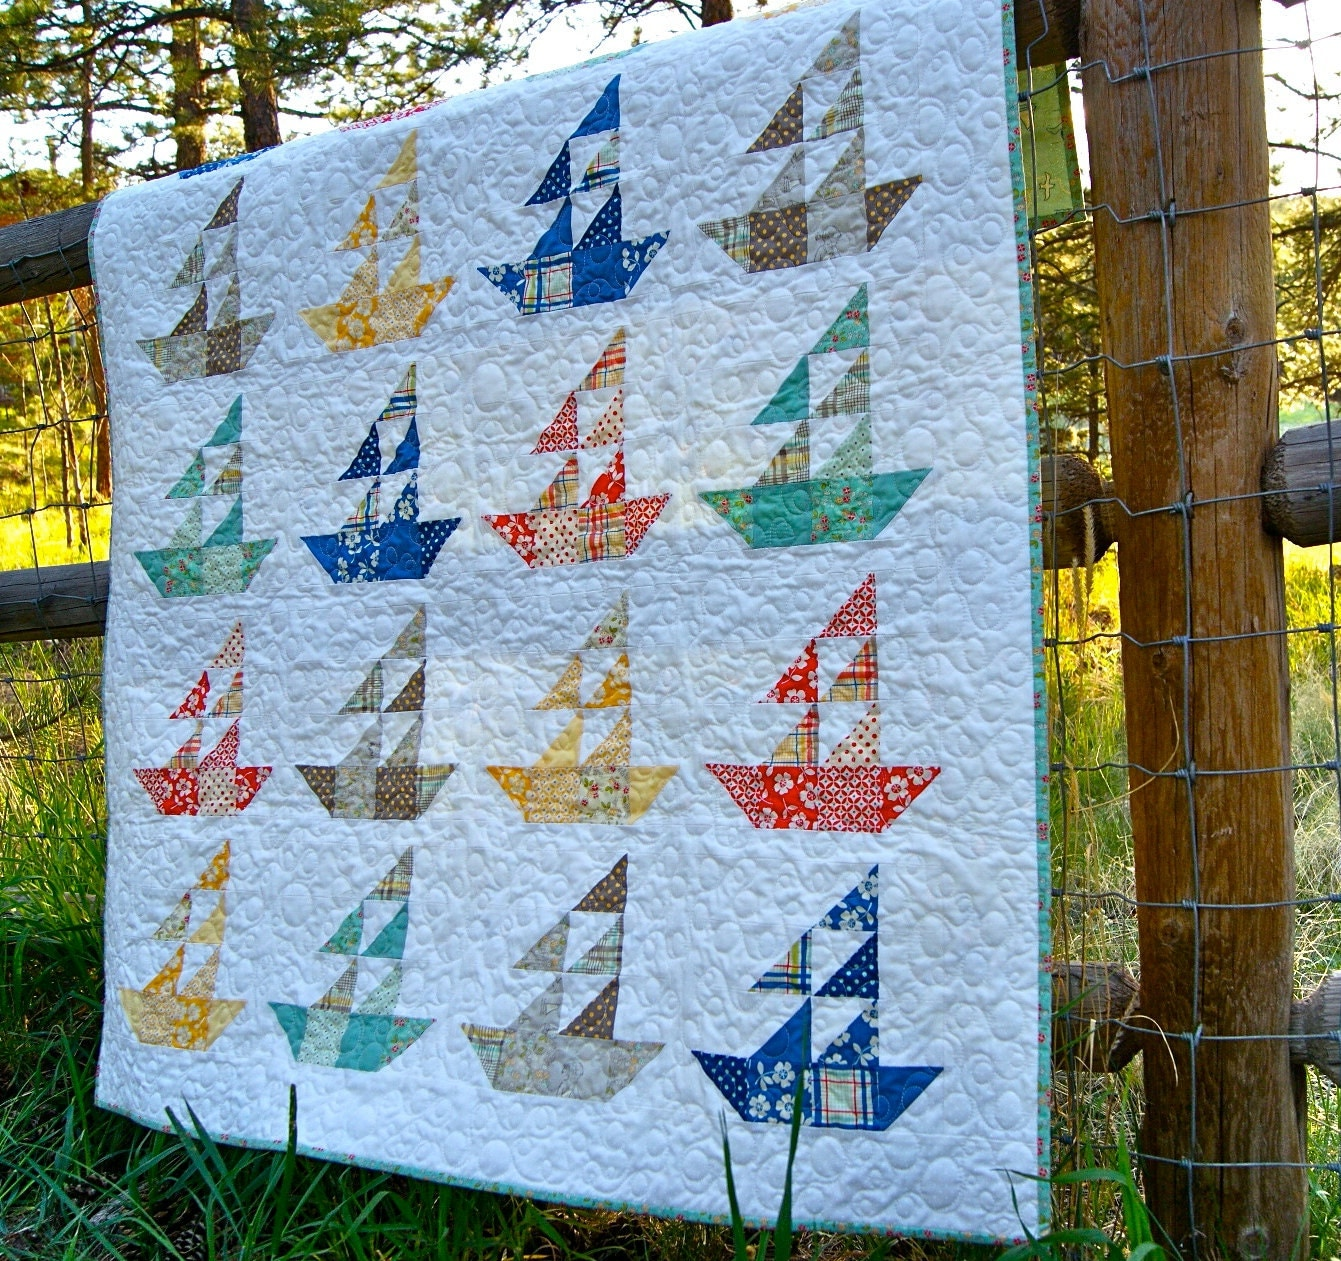 Quilt Baby Lap Handmade Seaside Sailboats Riley Blake Summer